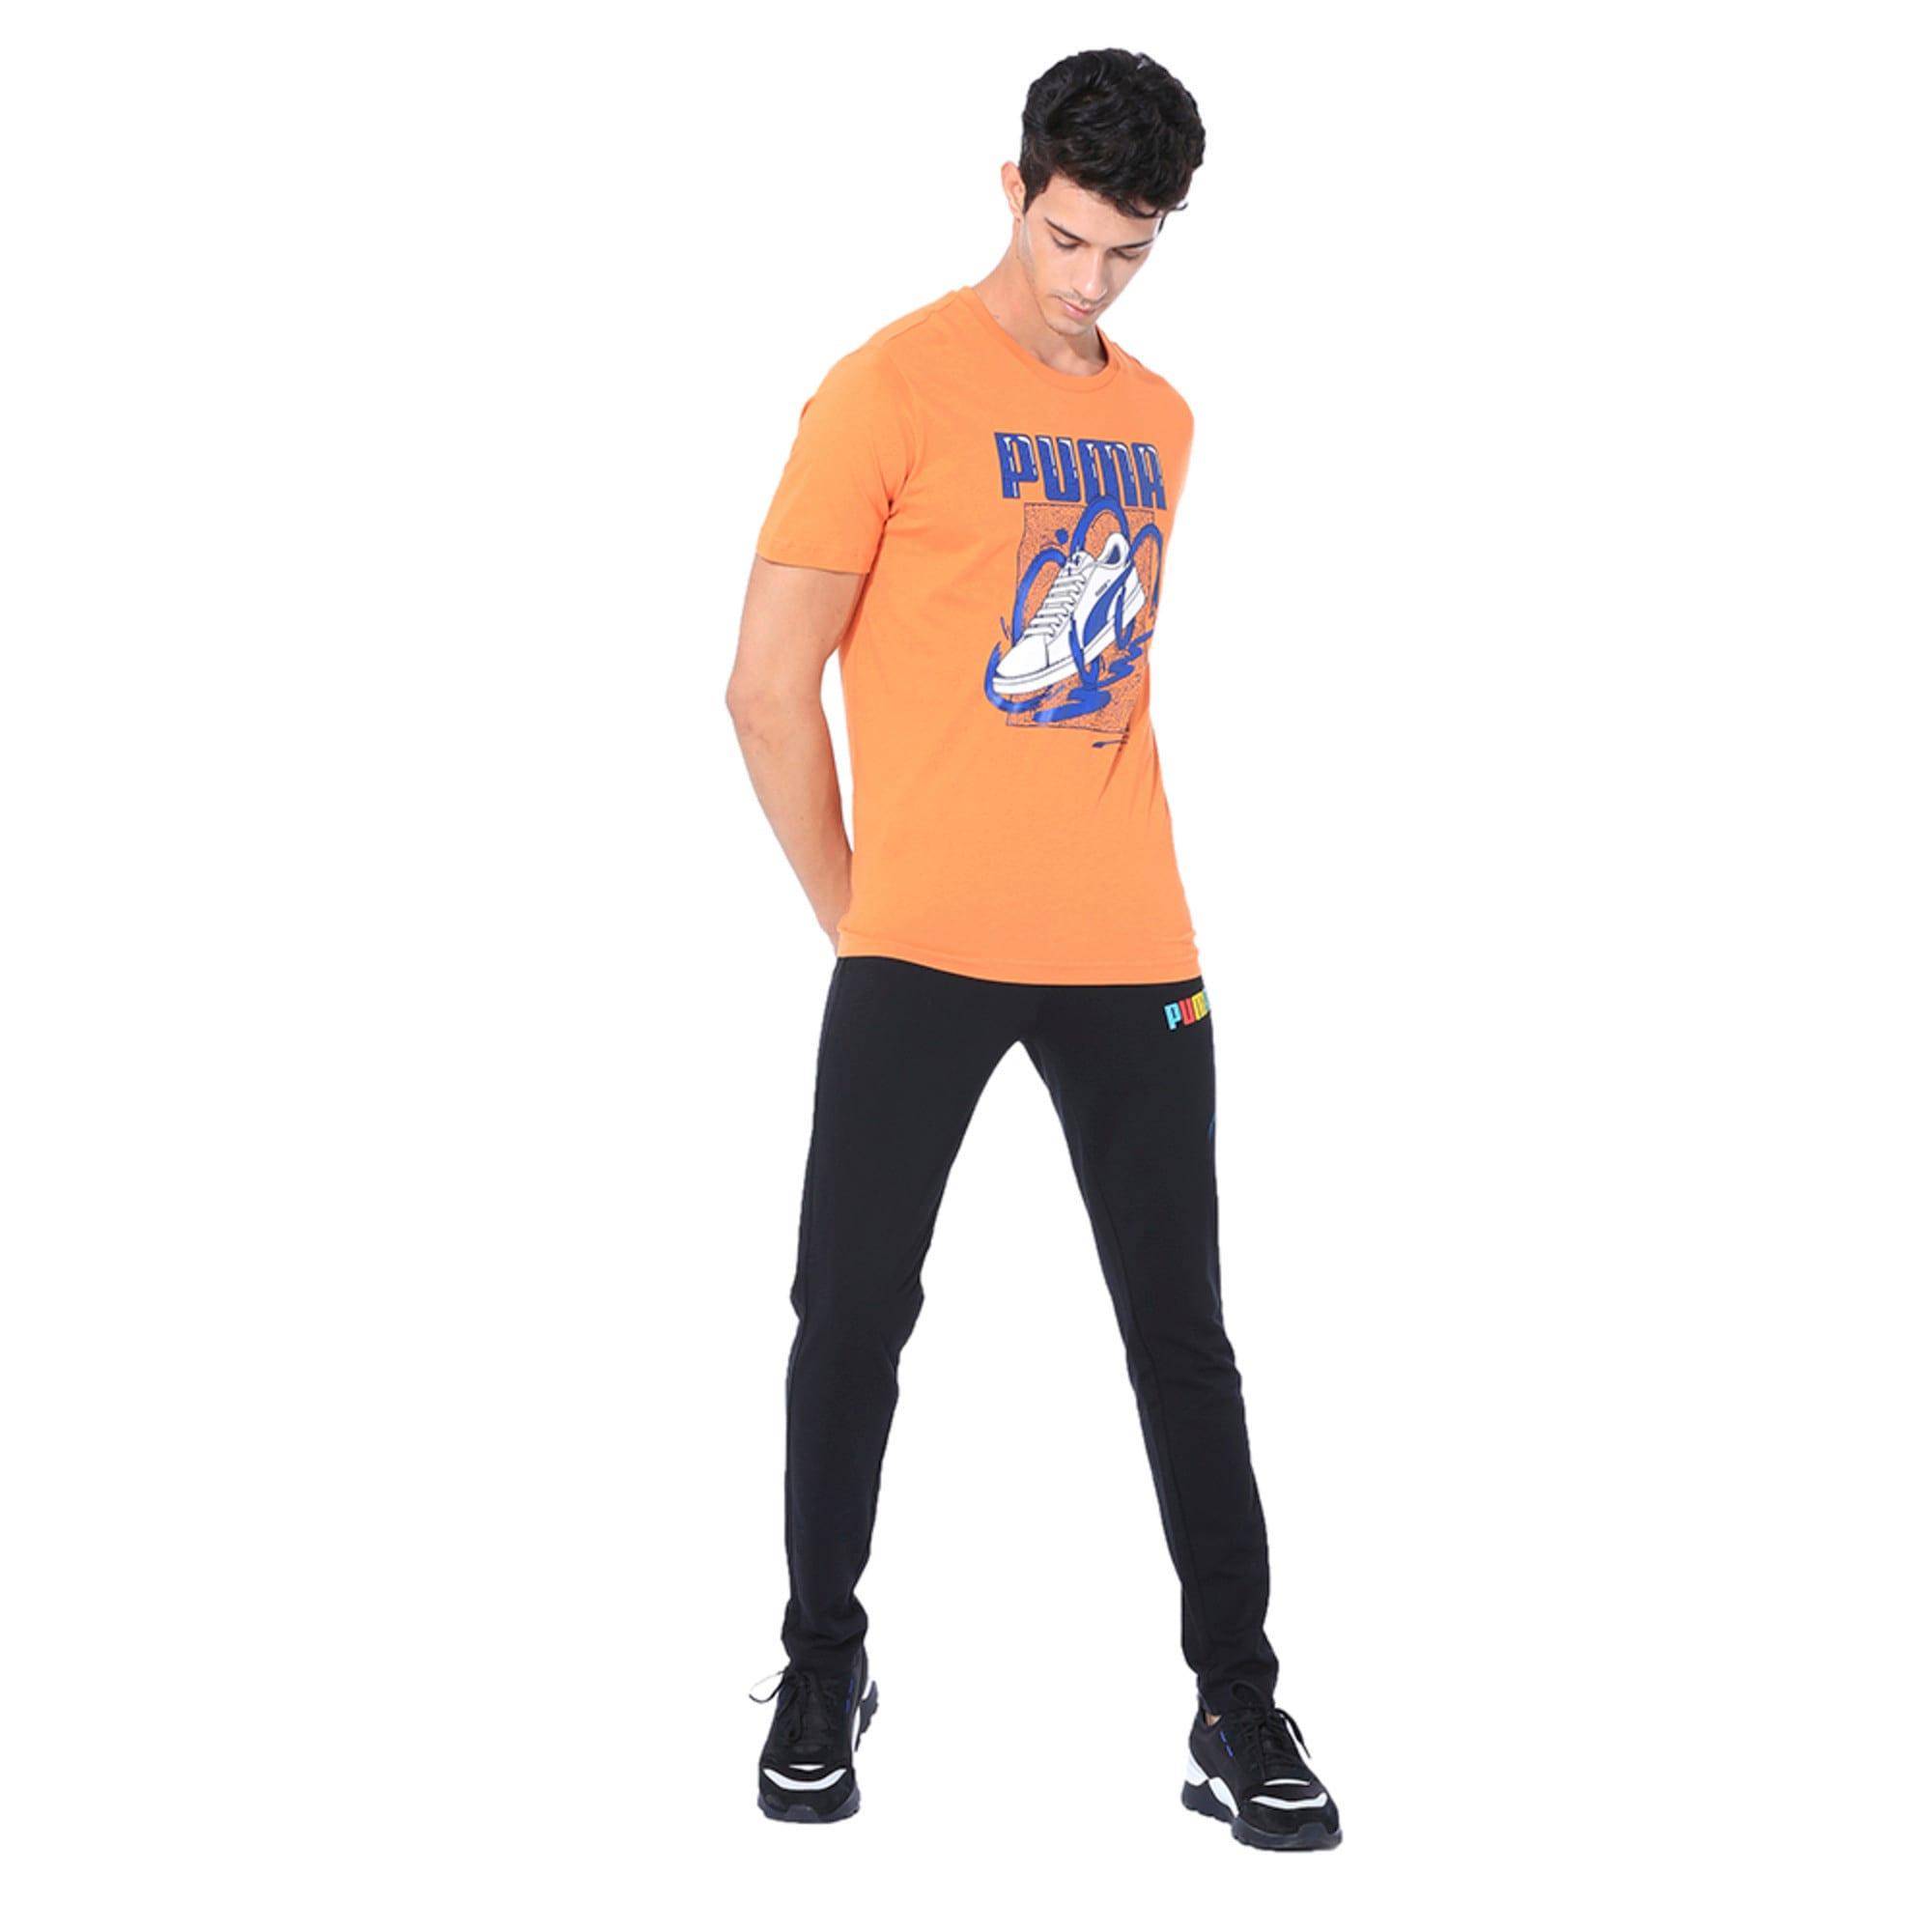 Thumbnail 3 of Sneaker Graphic Men's Tee, Jaffa Orange, medium-IND